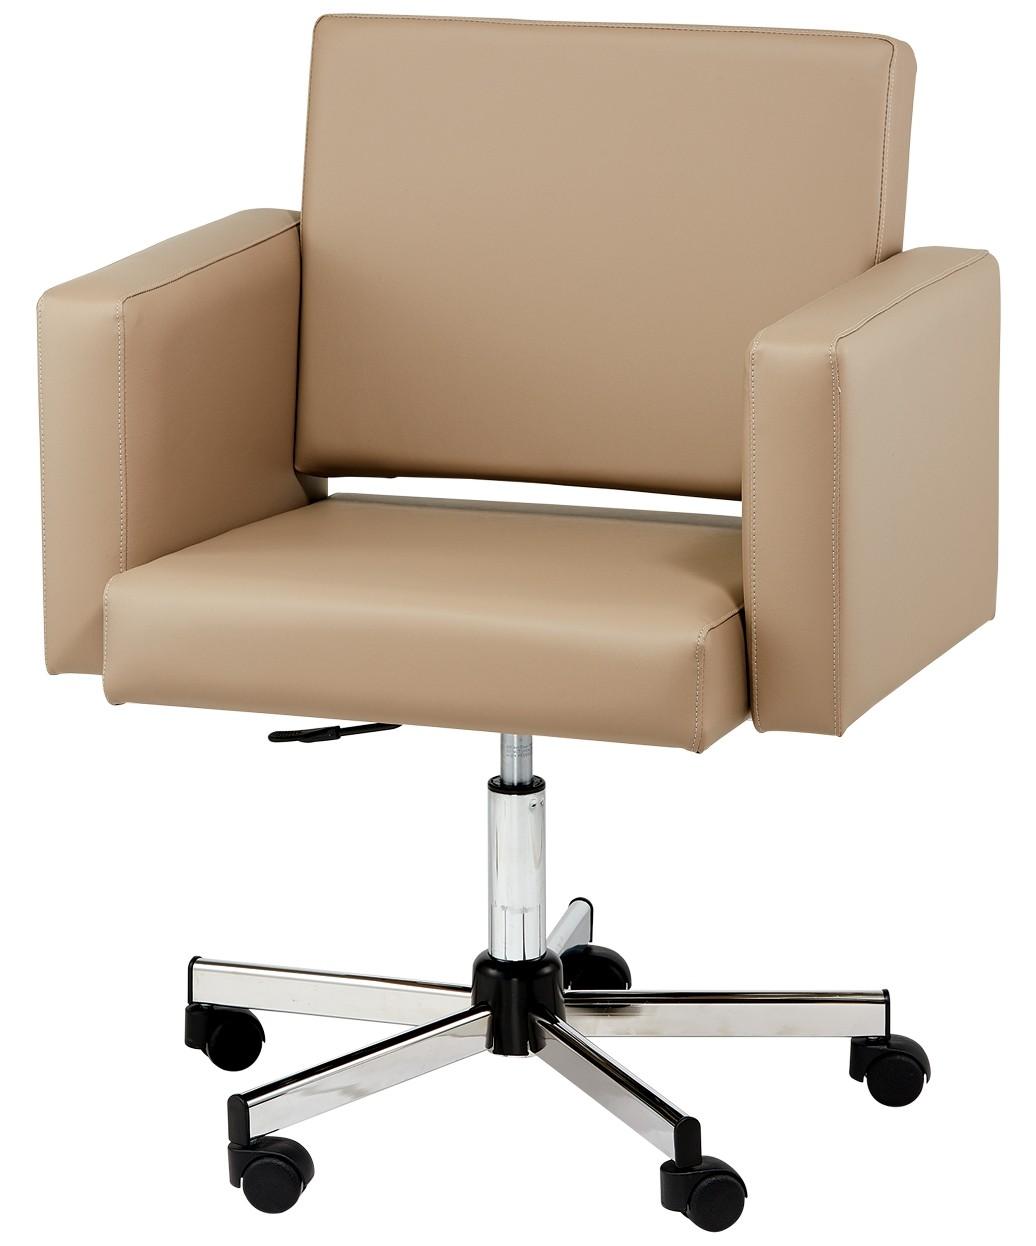 Pibbs 3492 Cosmo Desk Chair